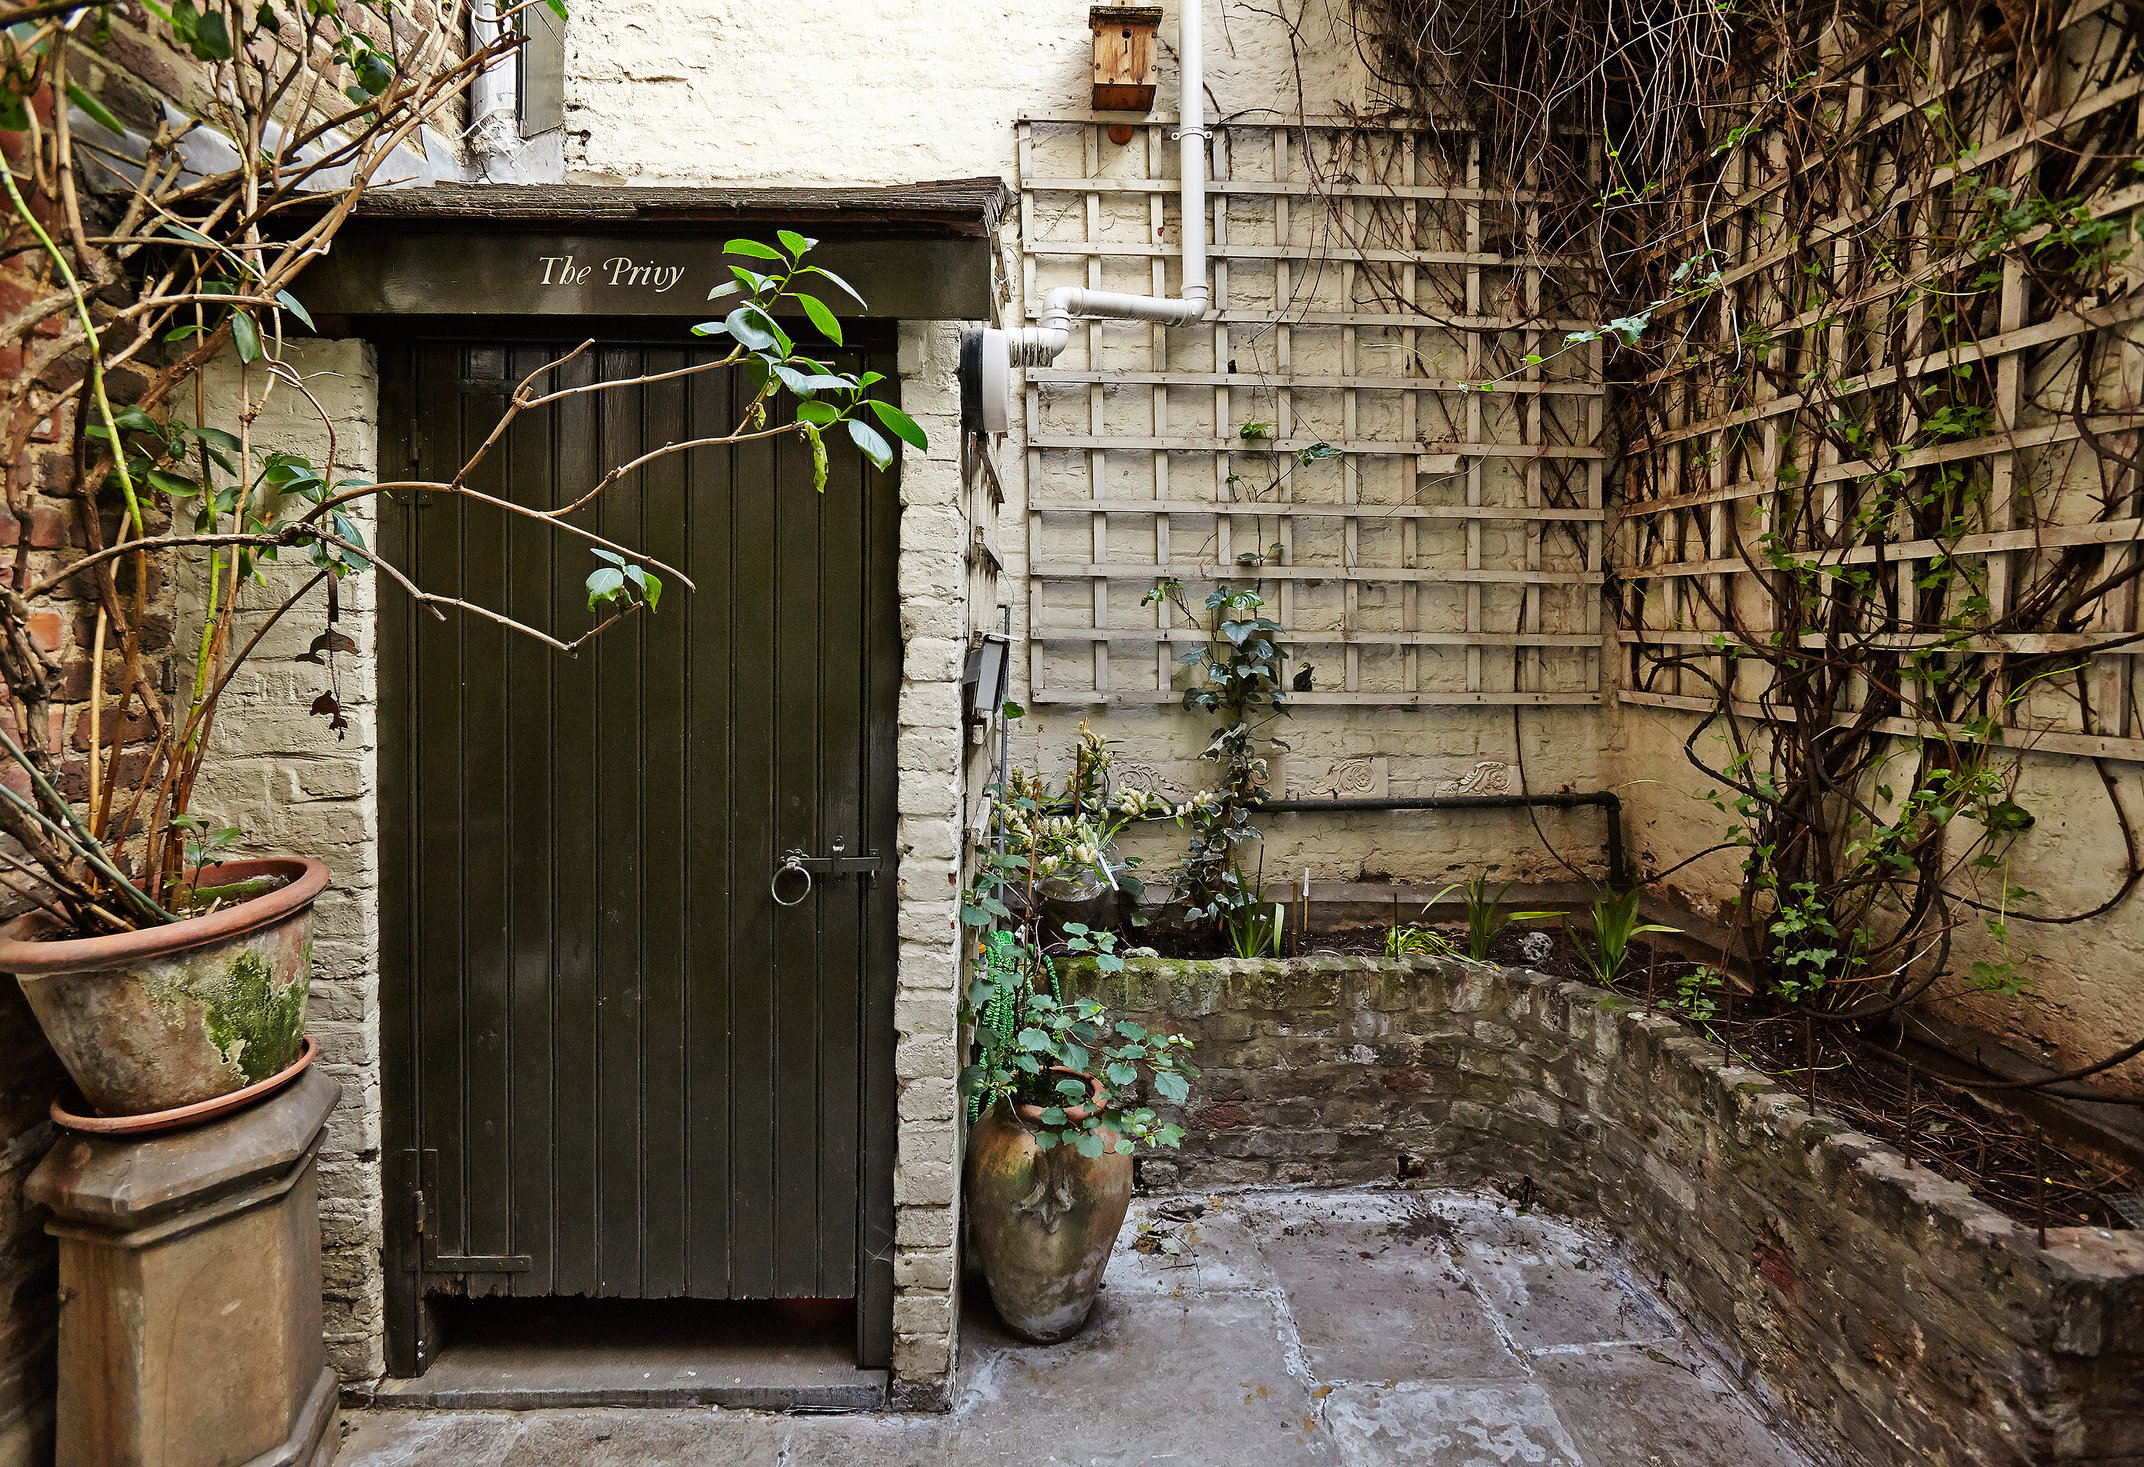 Family privy, 68 Dean Street, Soho, London.